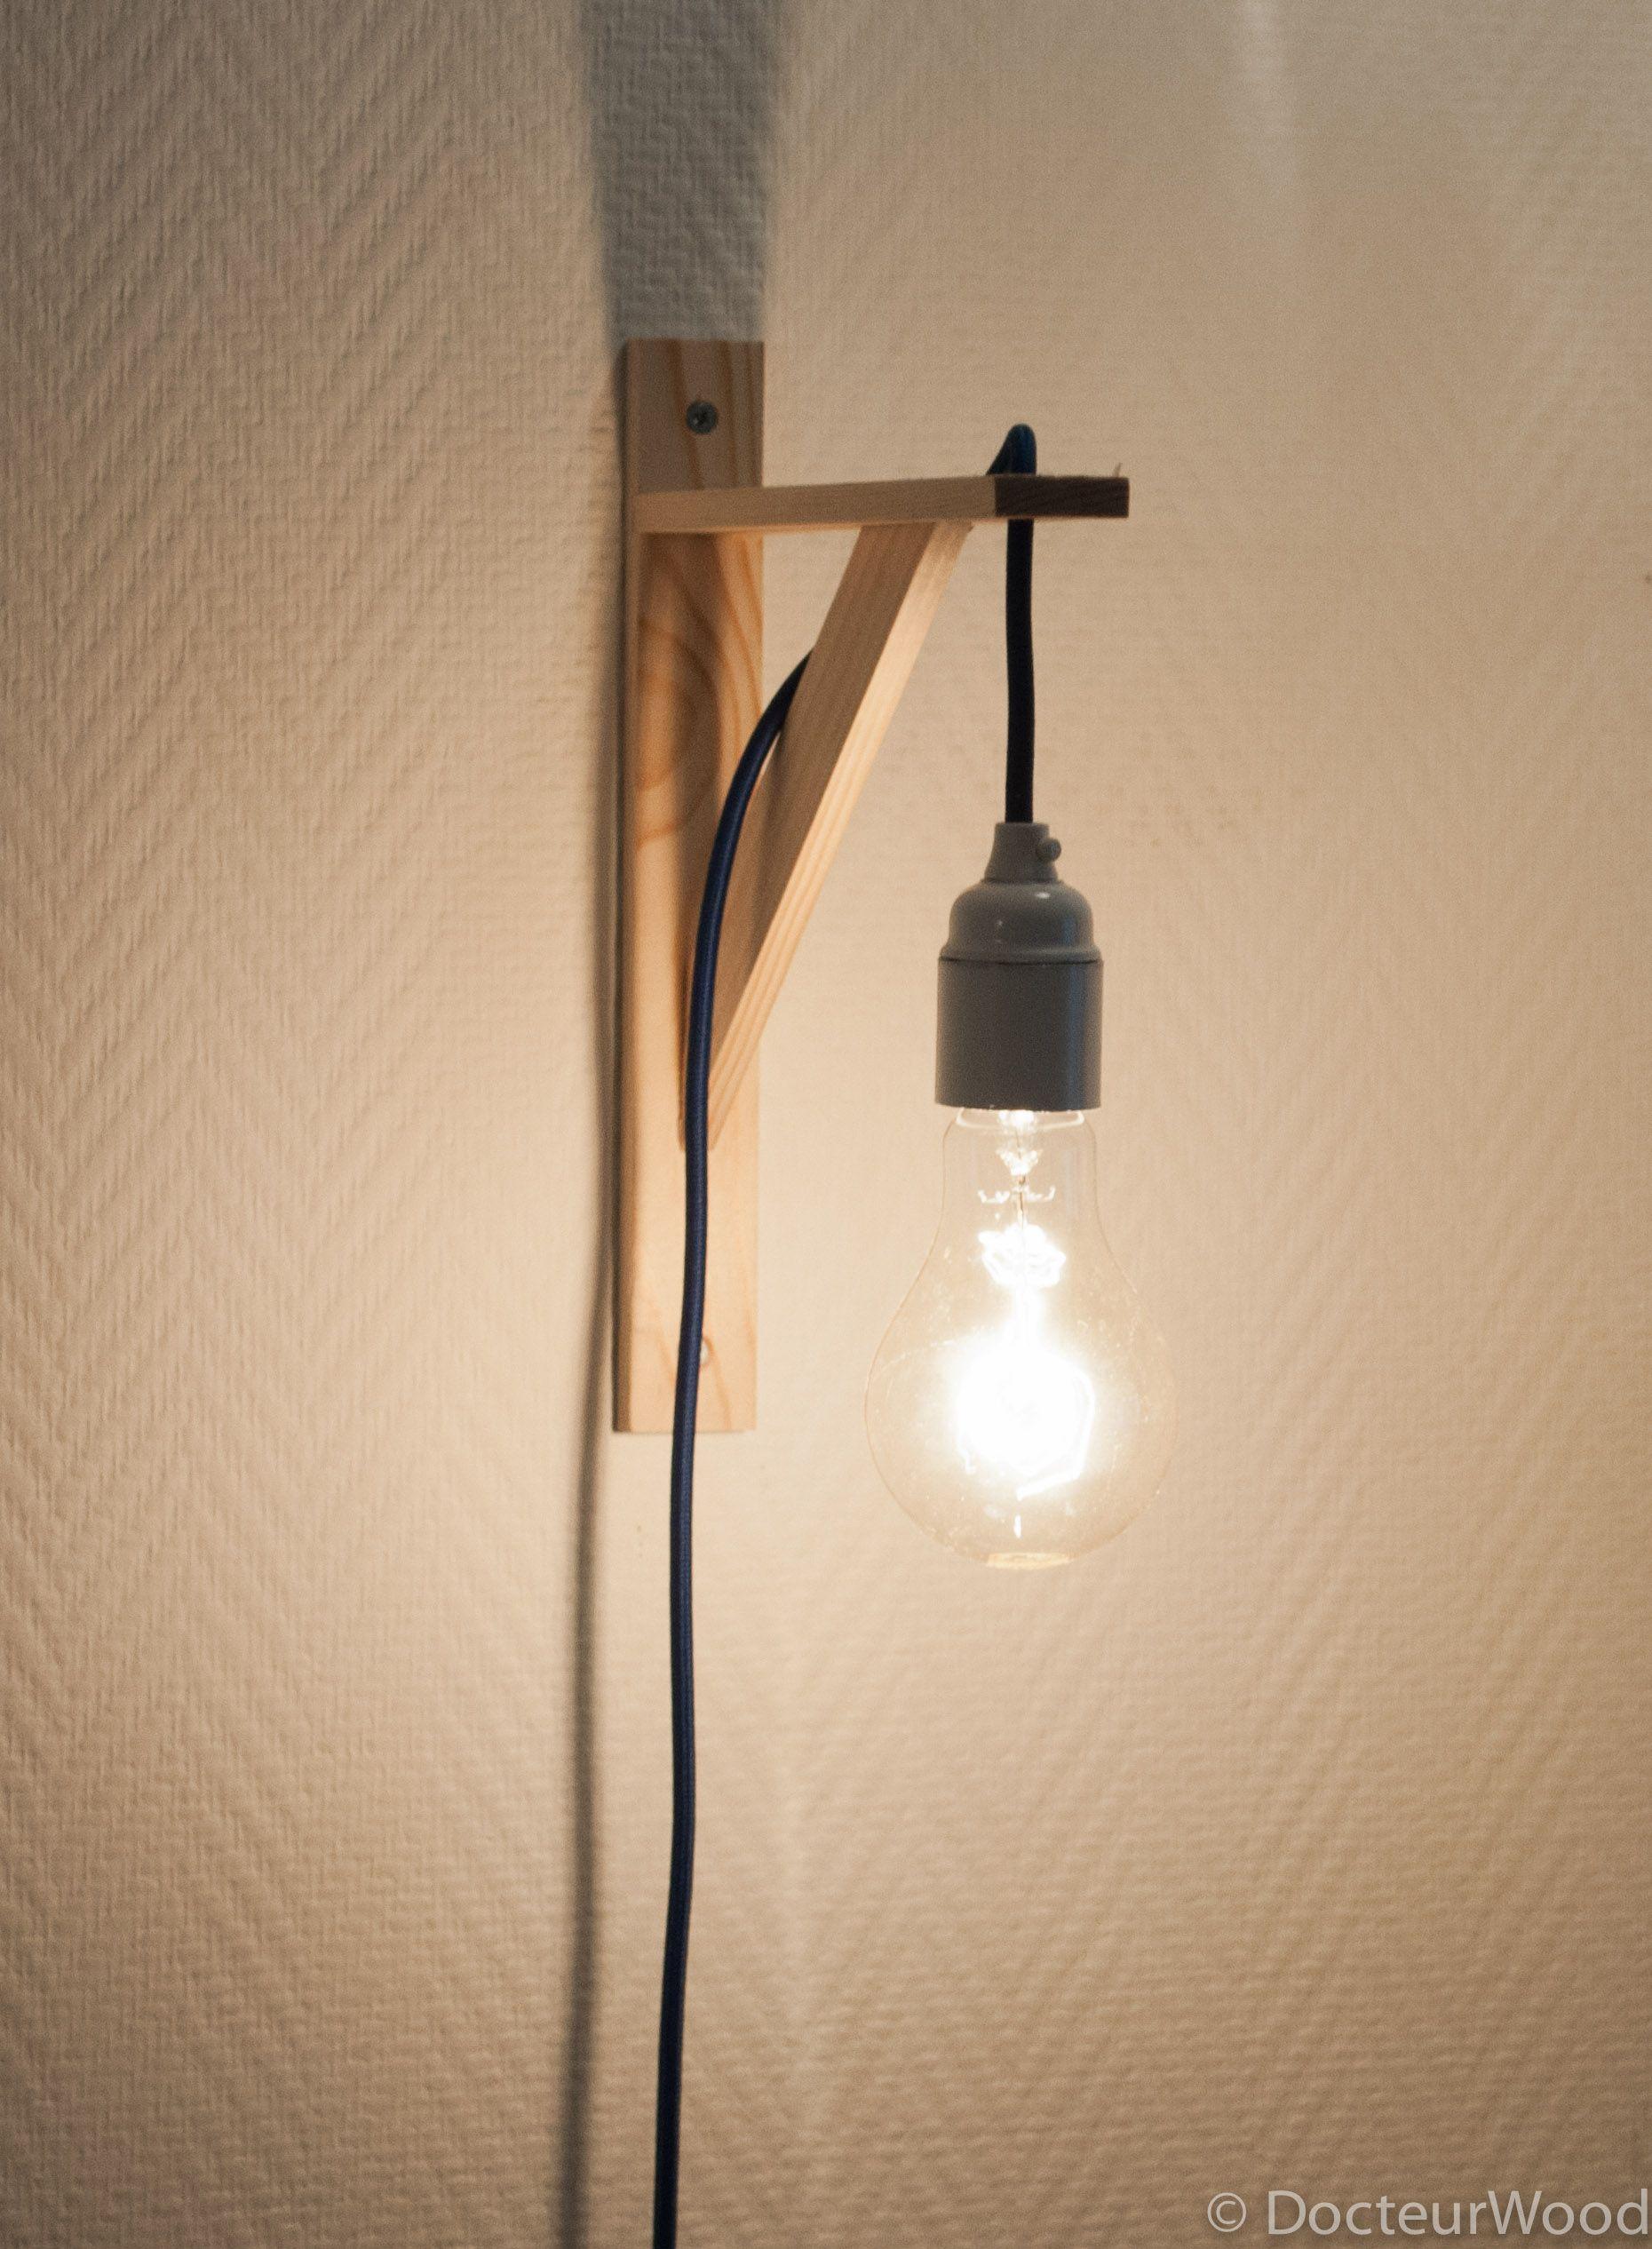 diy luminaire suspendu docteurwood 2 inspiration pinterest luminaire suspendu suspendu et. Black Bedroom Furniture Sets. Home Design Ideas